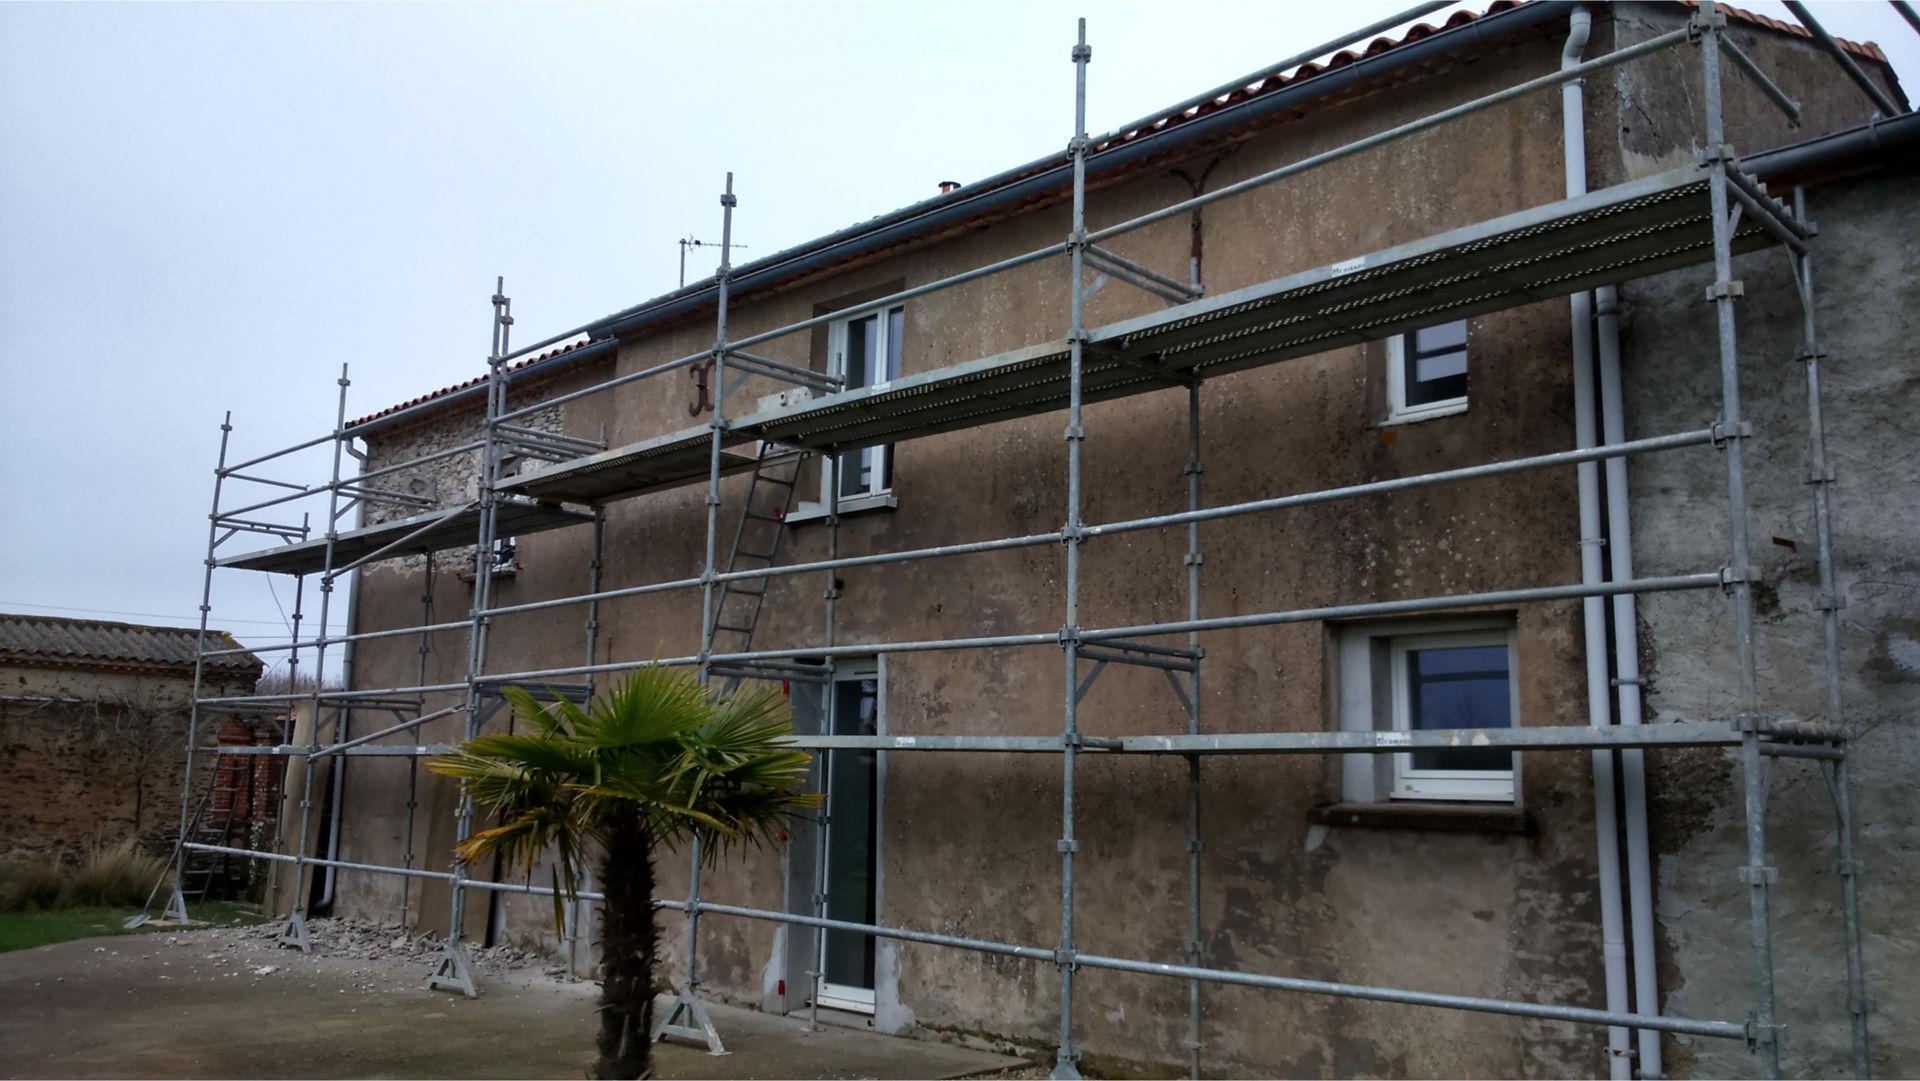 longere proche de nantes 44 - Rénovation de la façade Saint Aignant de Gran Lieu (44)